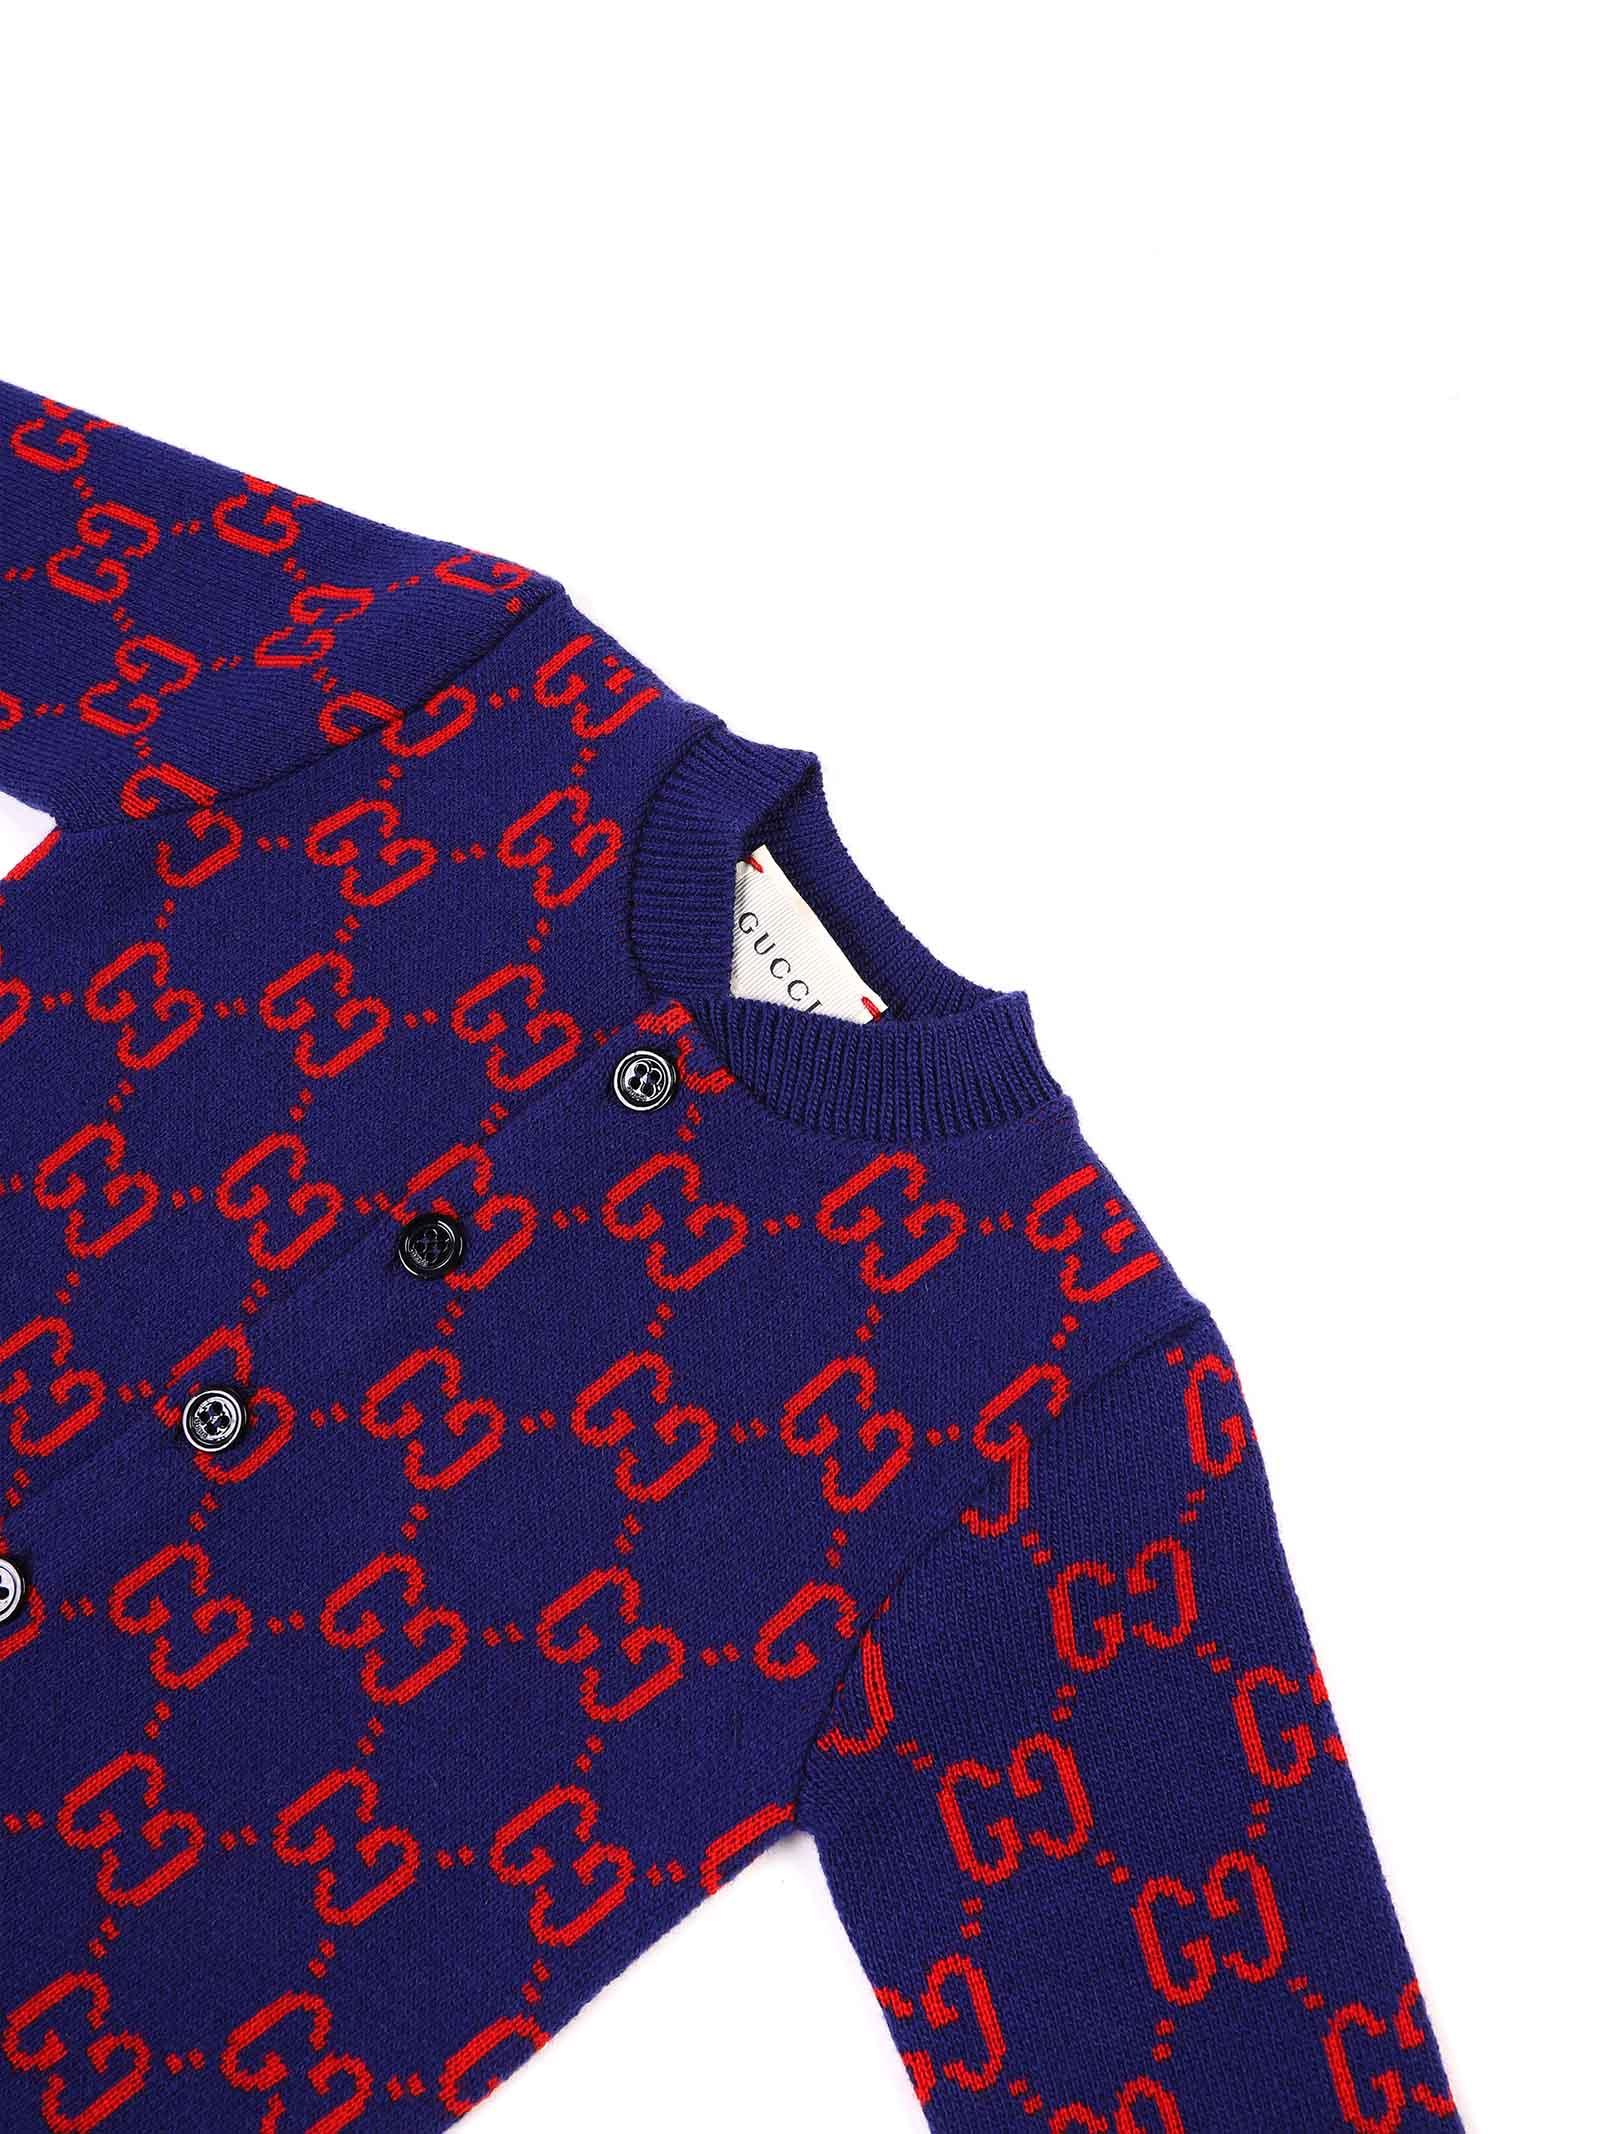 tutina fondo blu con logo rosso Gucci   Tutina   621875 XKBGY4175